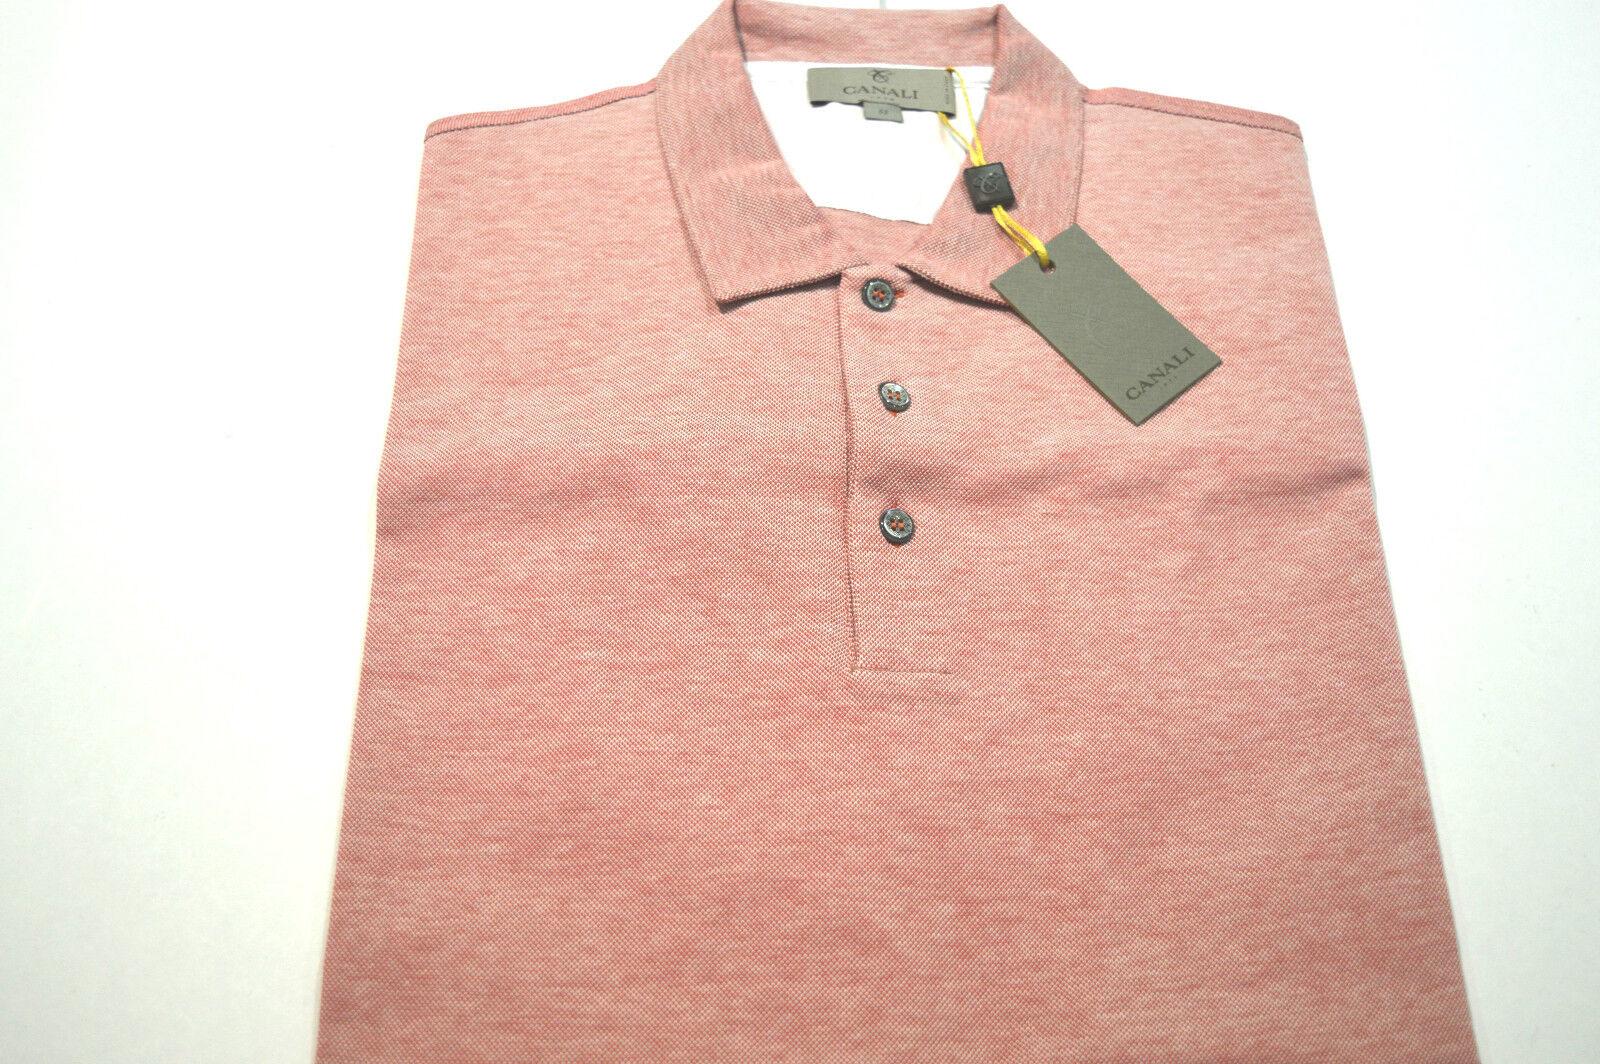 NEW  CANALI Polo  Short Sleeve 100% Cotton Größe 2XL Us Eu 56 Made in